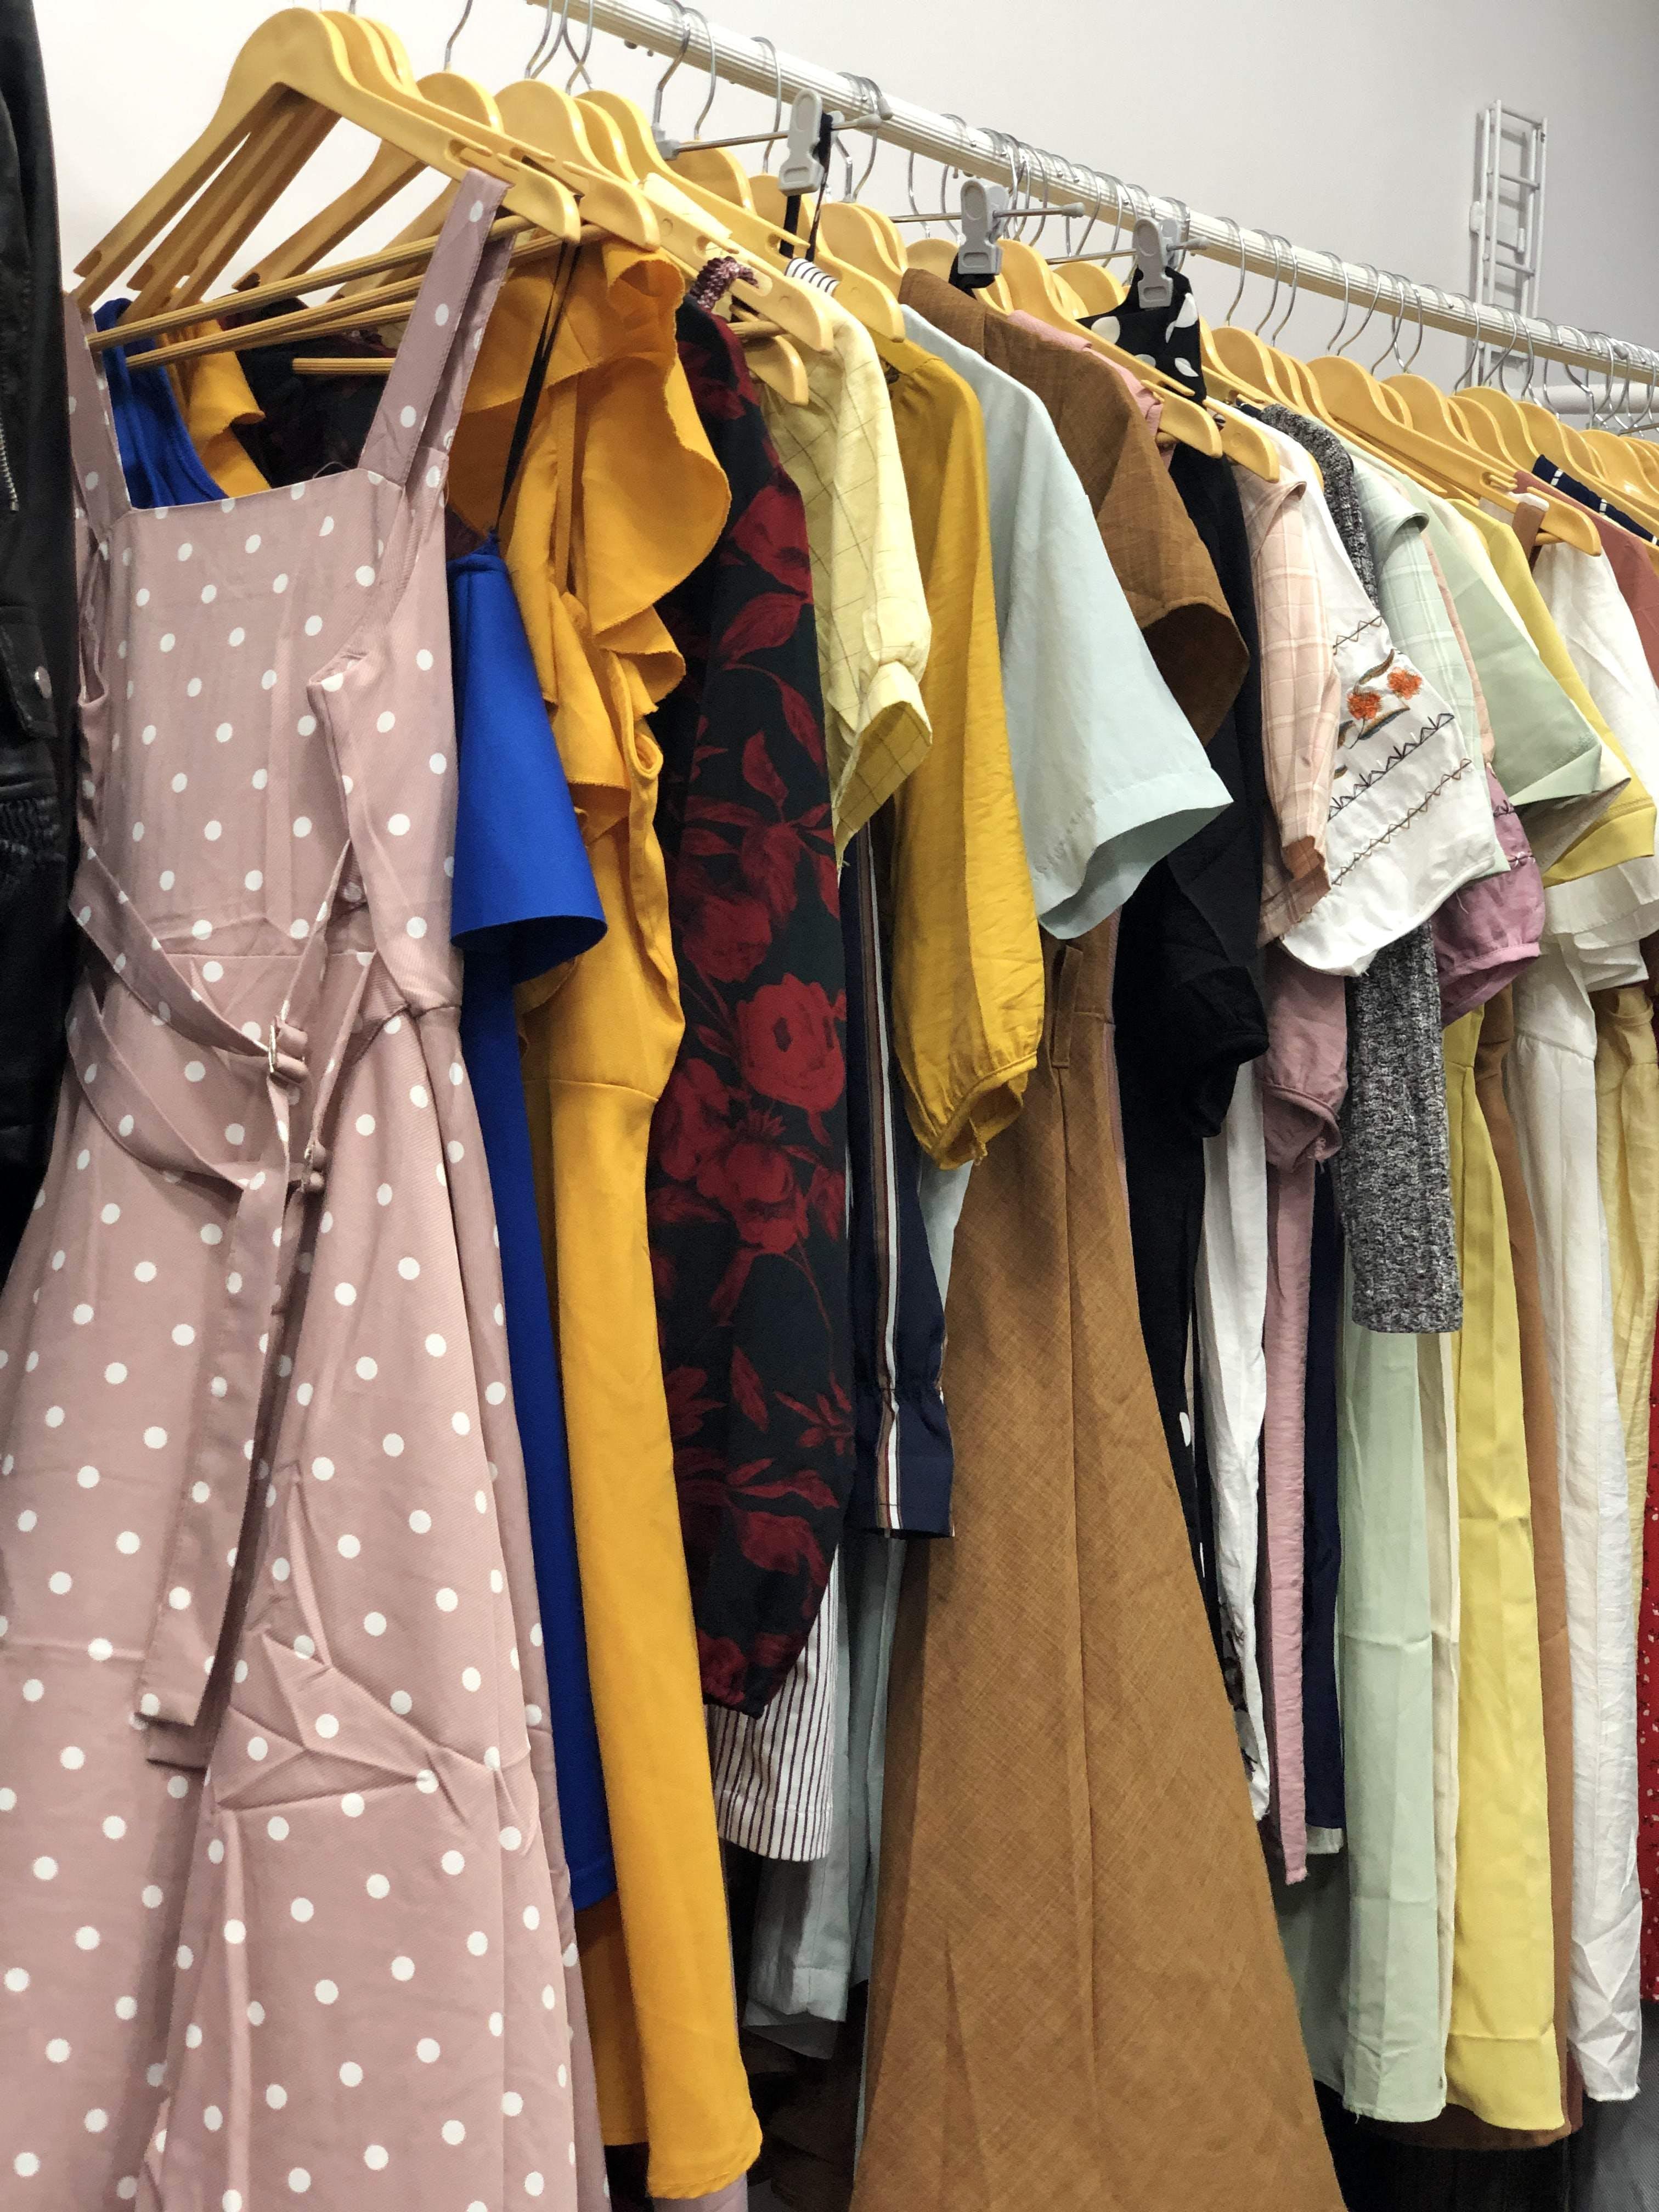 Clothes hanger,Clothing,Boutique,Yellow,Room,Outerwear,Textile,Dress,Fashion design,Costume design